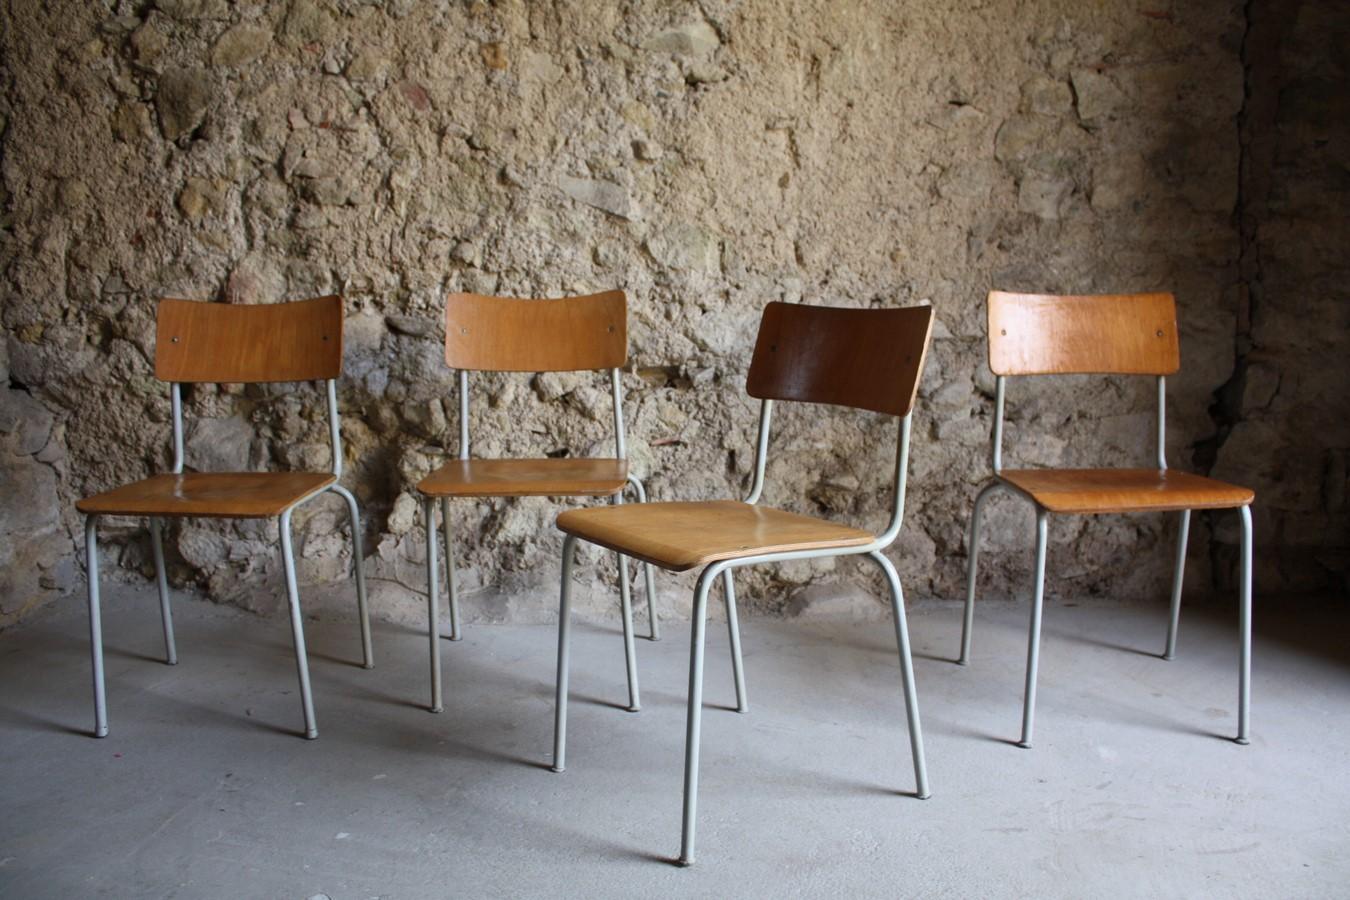 Loft Industrie Gebraucht Stühle Vintage Holz73A Design Stuhl CxreBdo